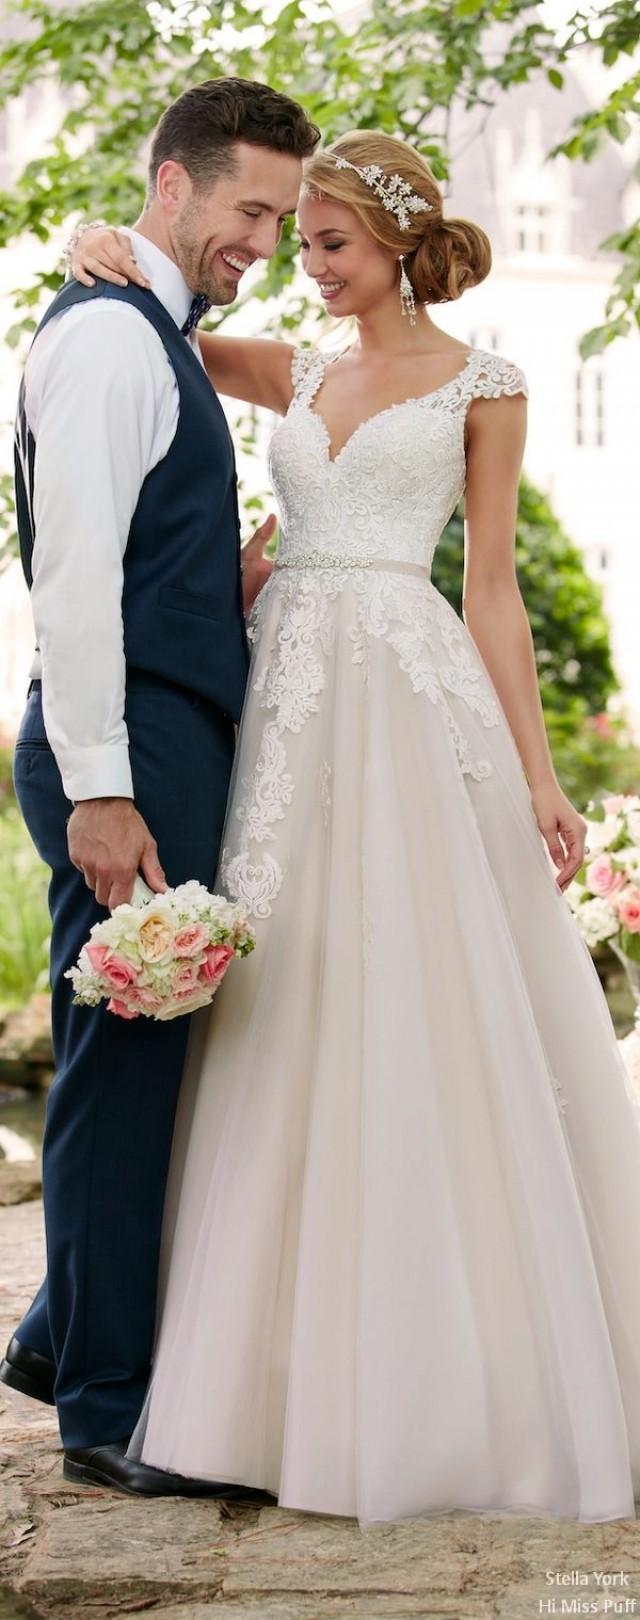 b992850875d Dress - Stella York Wedding Dresses 2017  2711624 - Weddbook